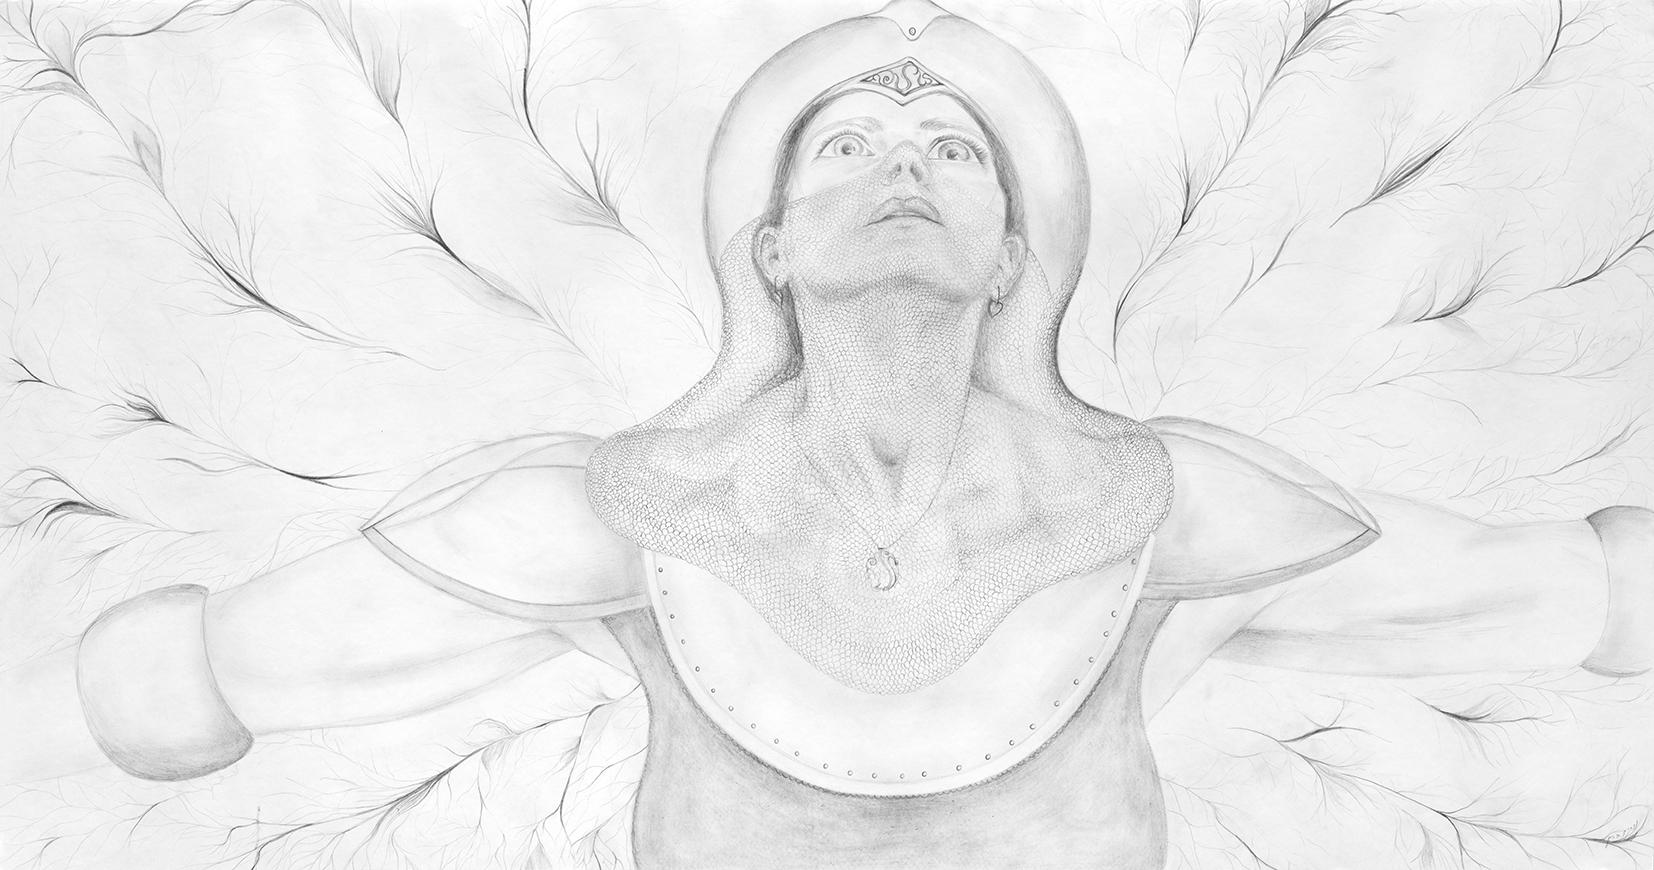 Under armored wings #7 By Nurit Barak kachtan